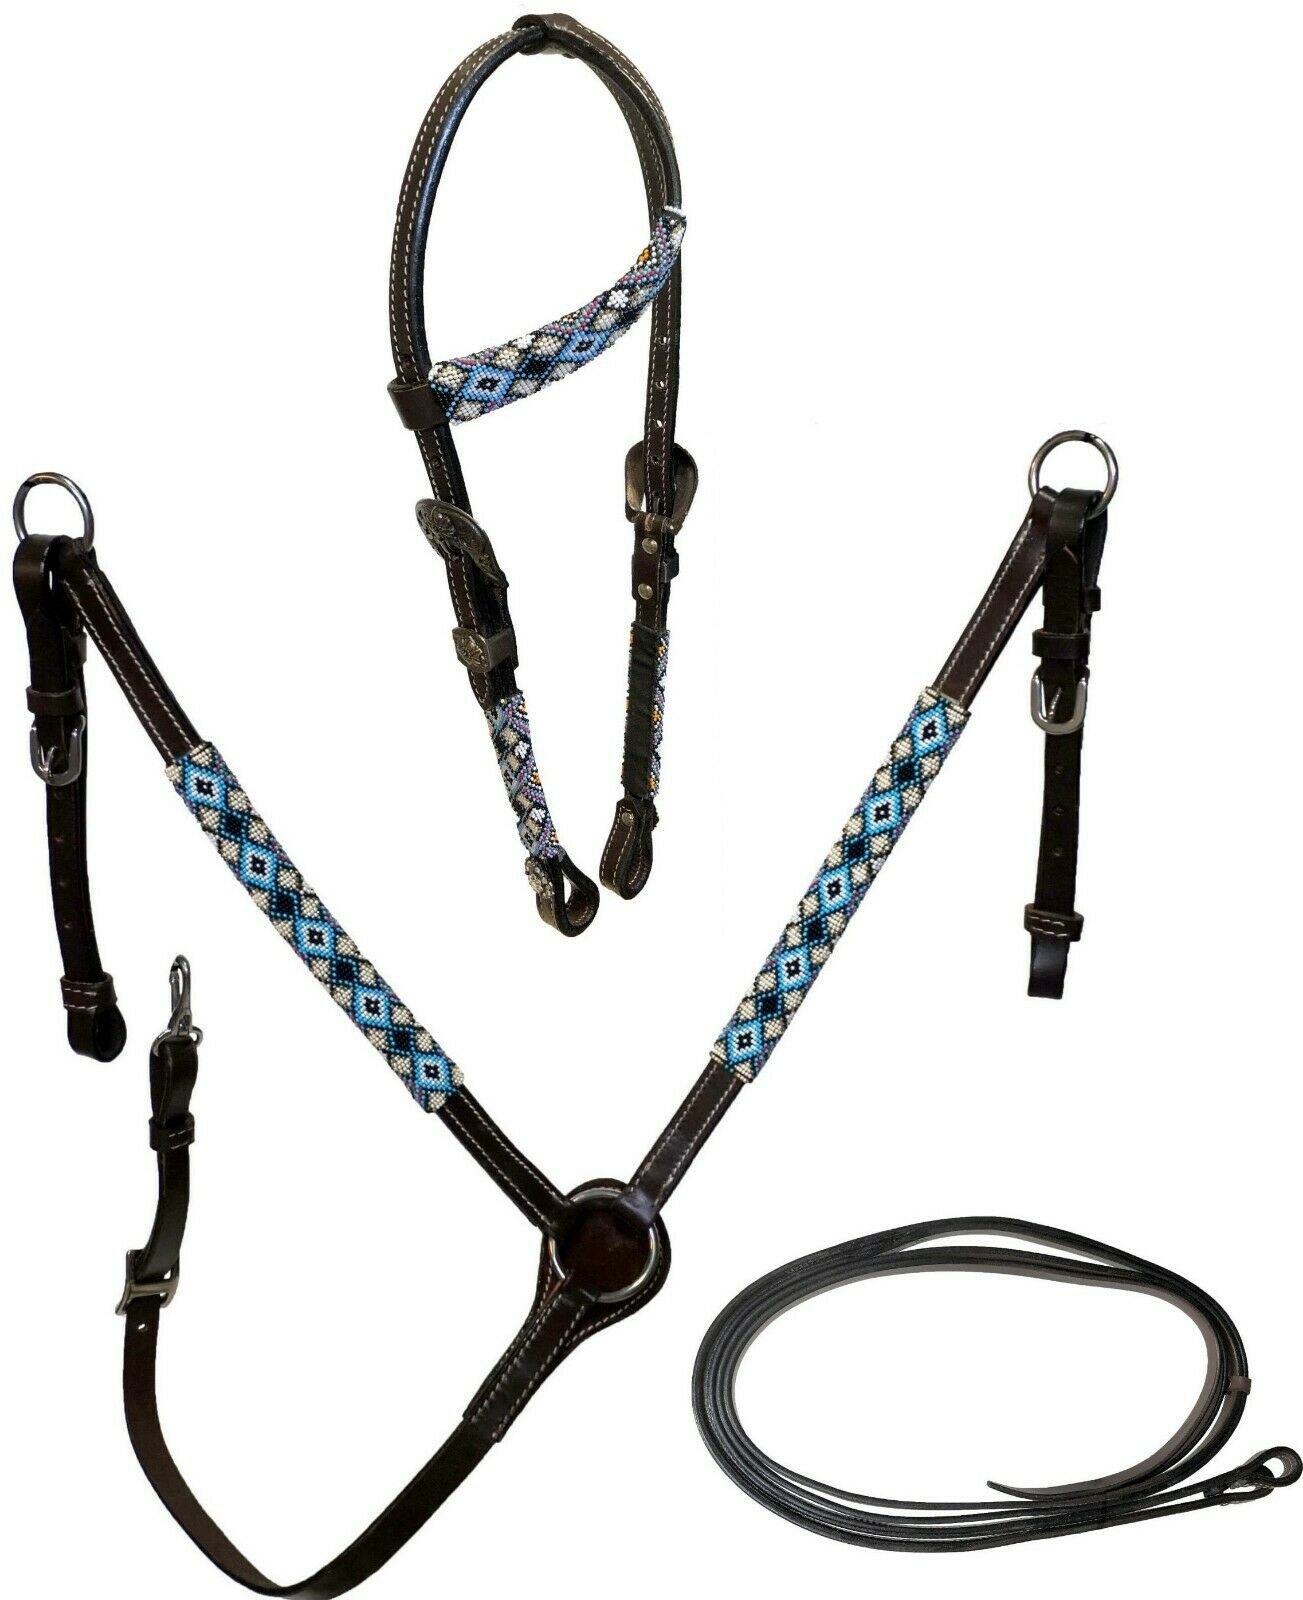 Equitem aceite oscuro cuero cabezada breastcollar Conjunto Azul Negro Diamante Grano Envoltura